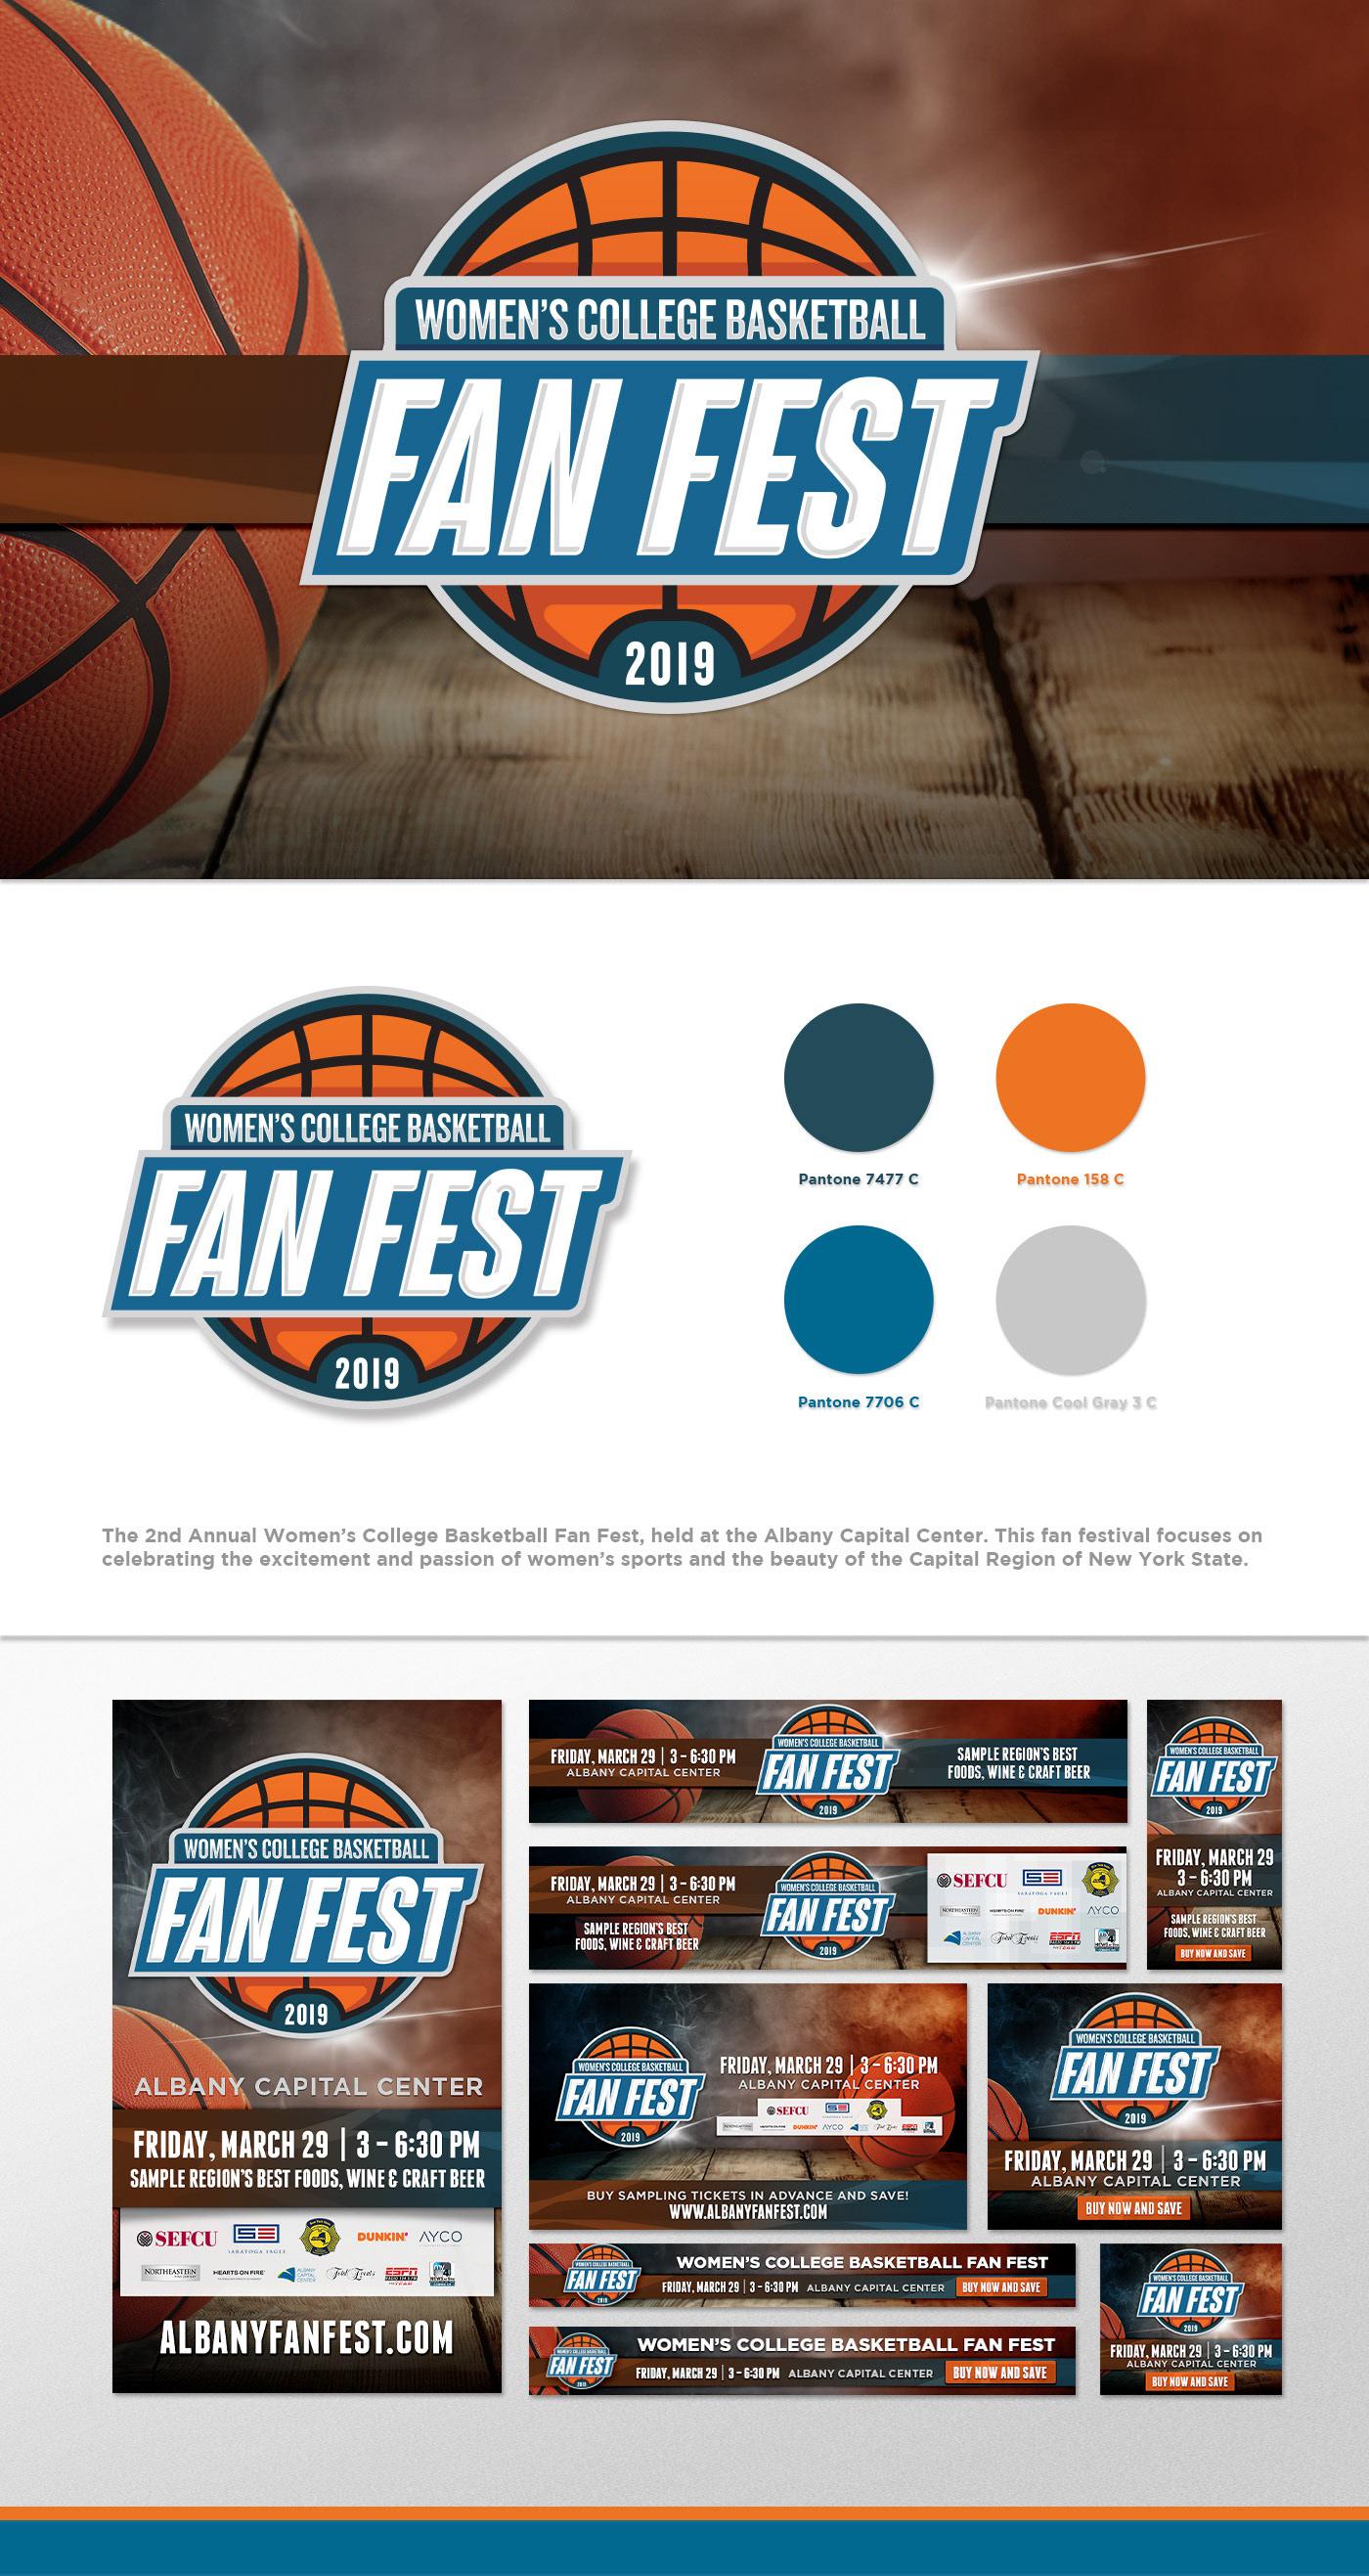 college basketball fan festival women's sports Albany NCAA New York